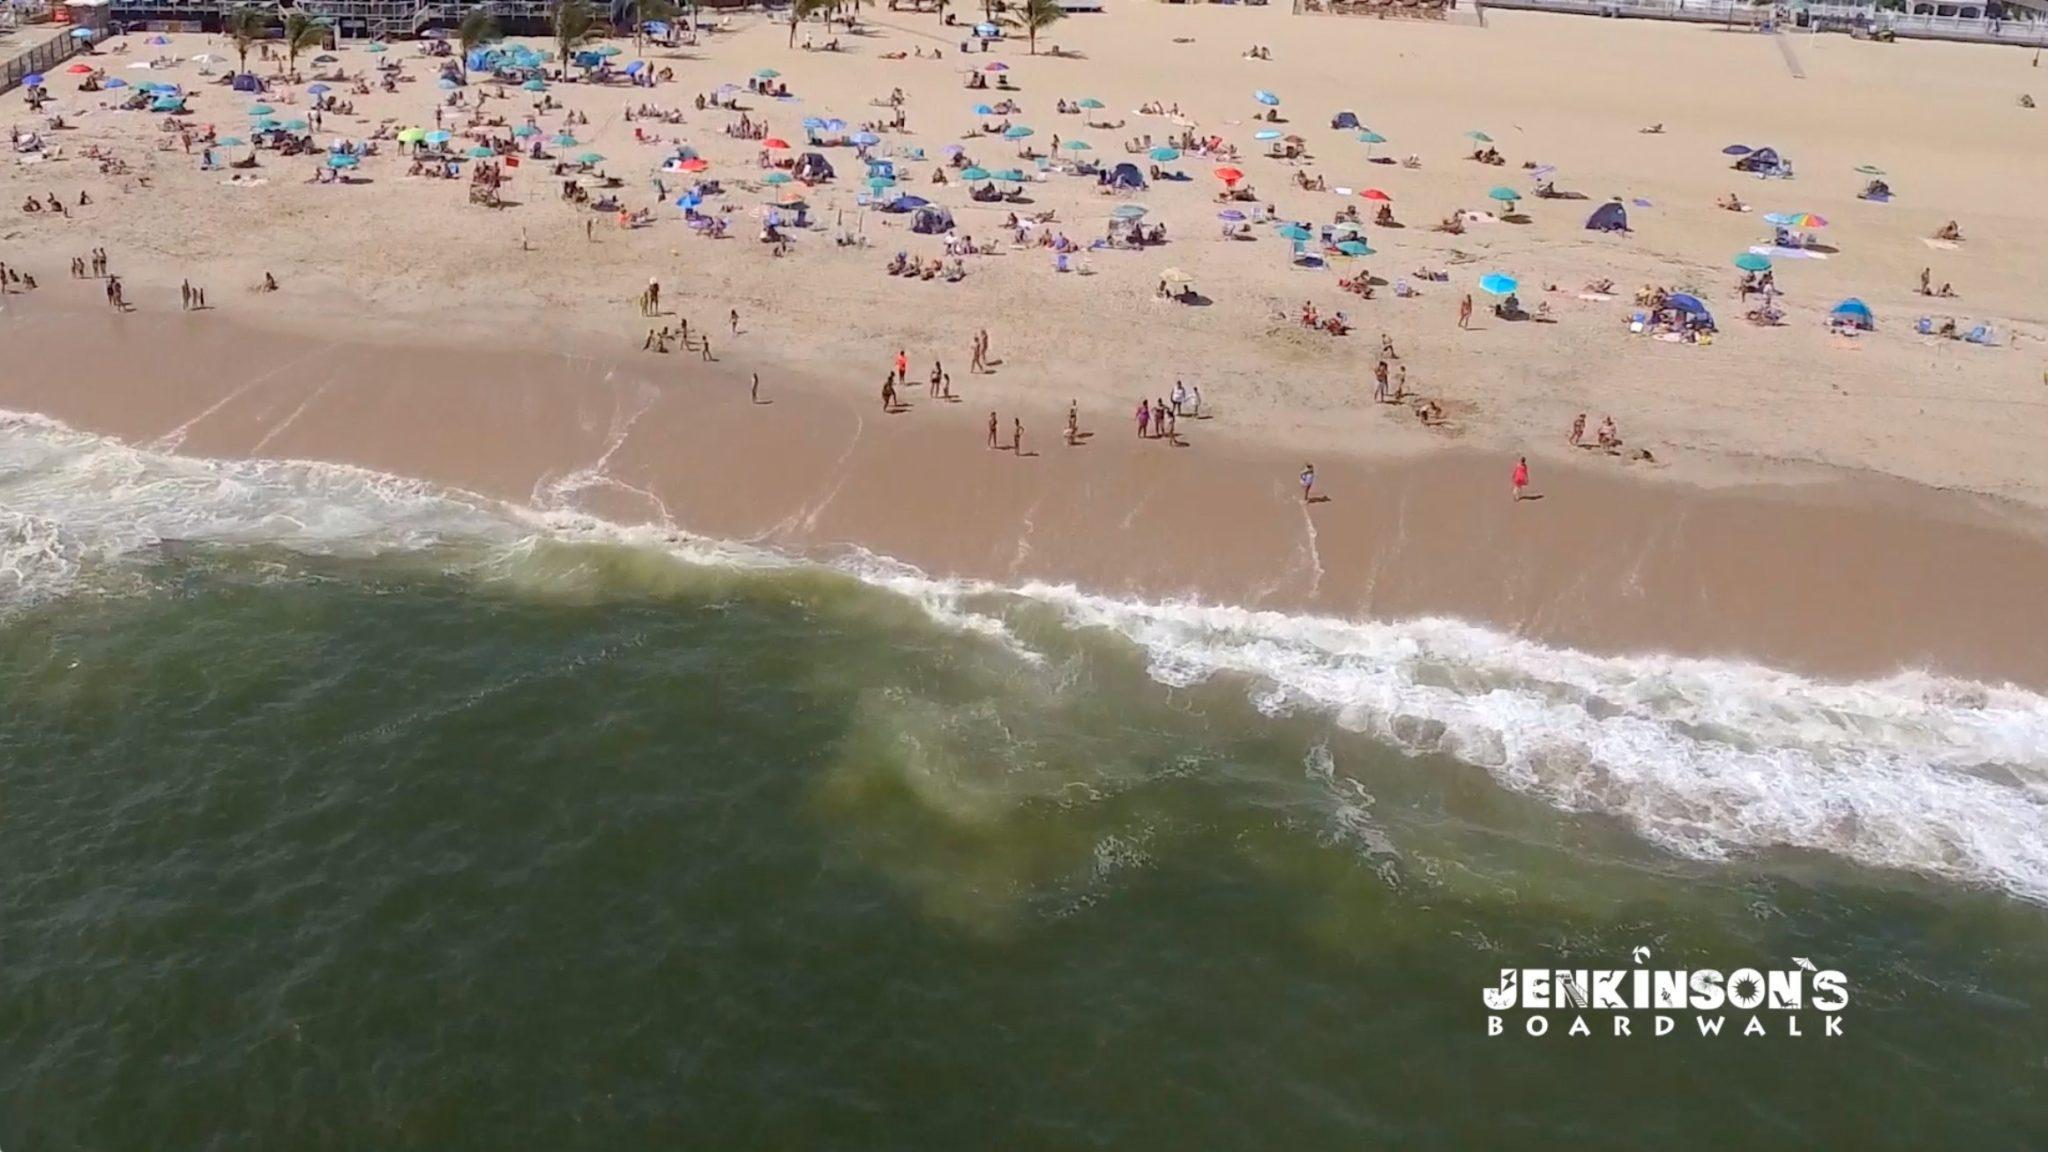 So Pleasant It Is To Have Money Heigh >> Jenkinson S Boardwalk Point Pleasant Beach Nj